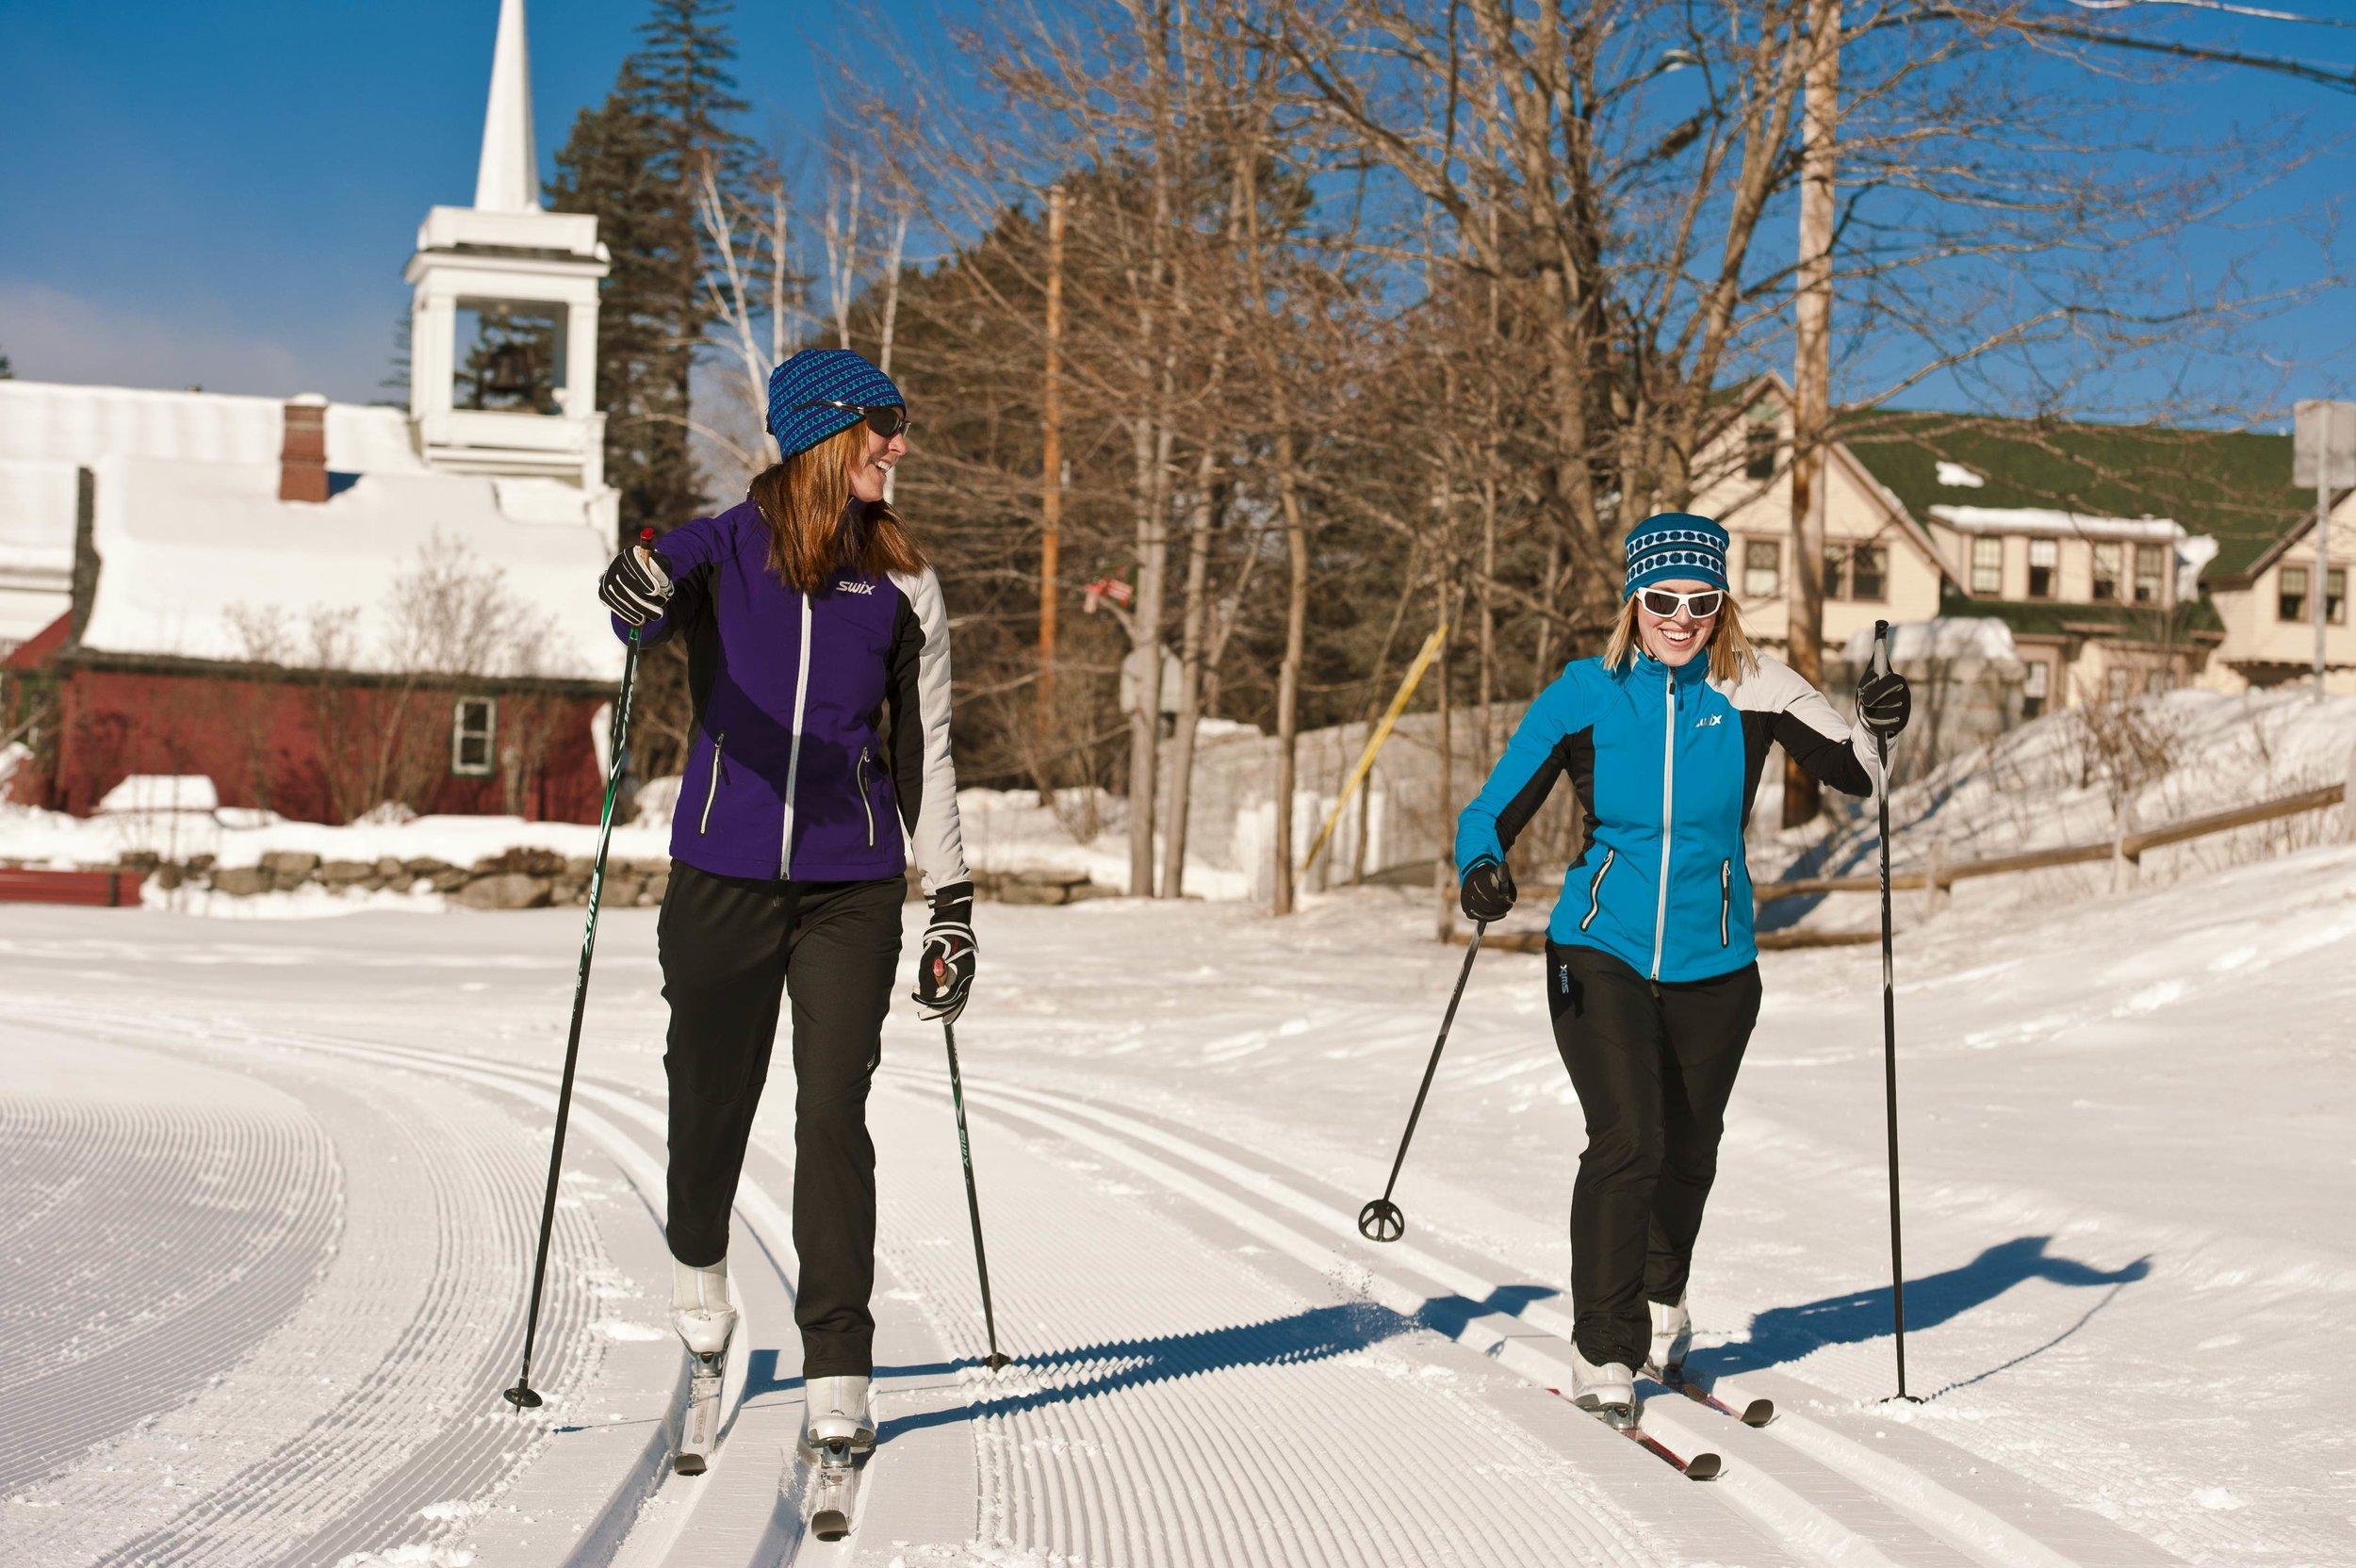 Morning ski on trails at Jackson, NH